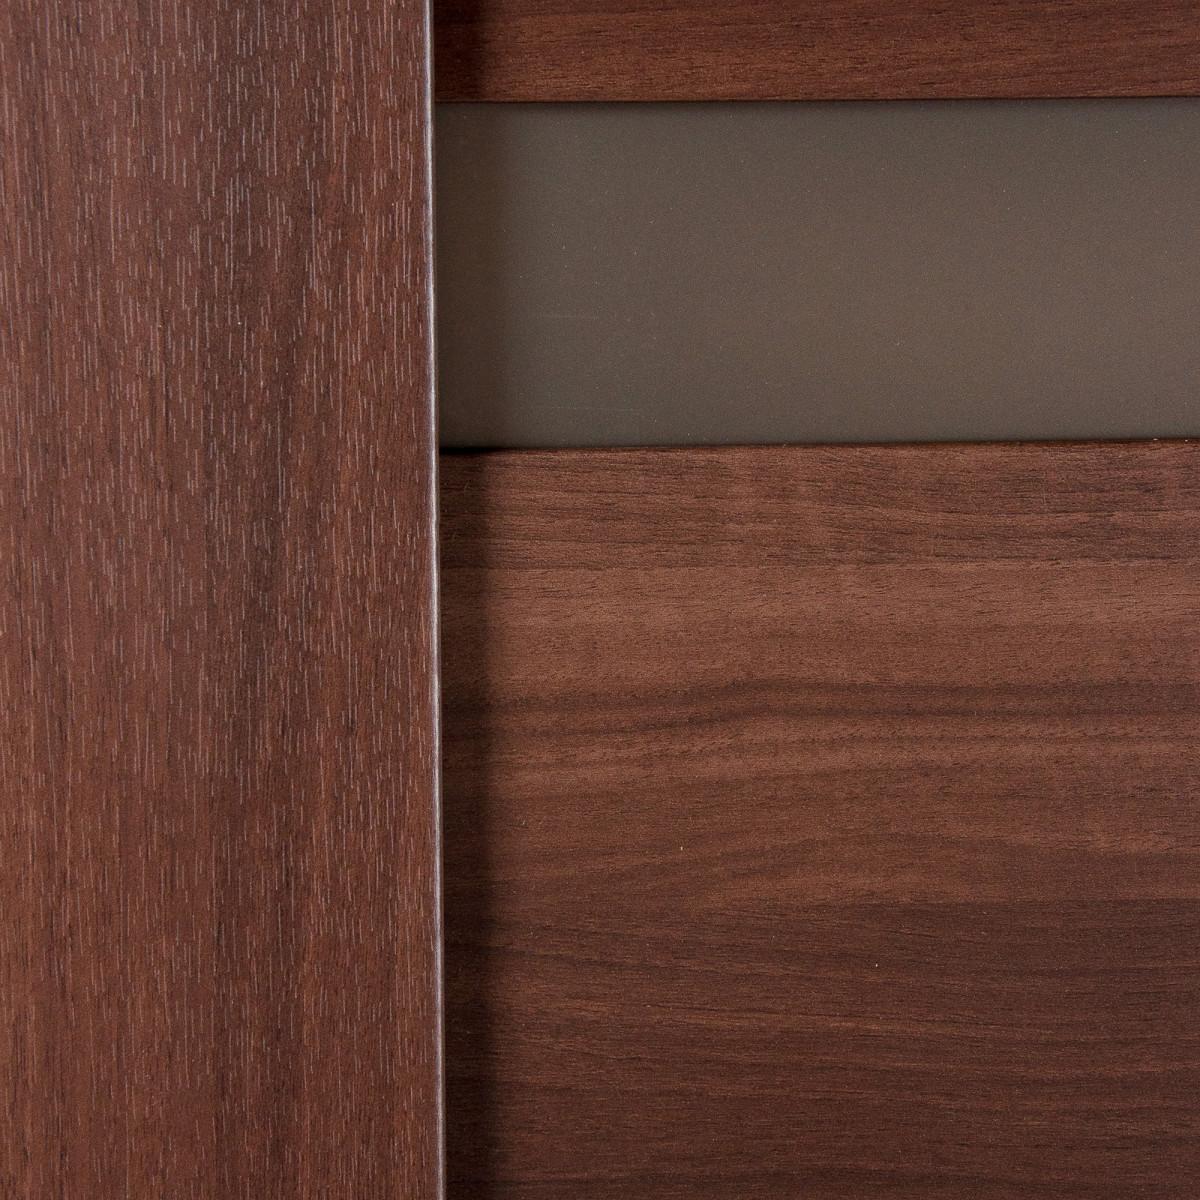 Дверь Межкомнатная Глухая Artens Велдон 80x200 Цвет Мокко/Бронза Без Фурнитуры